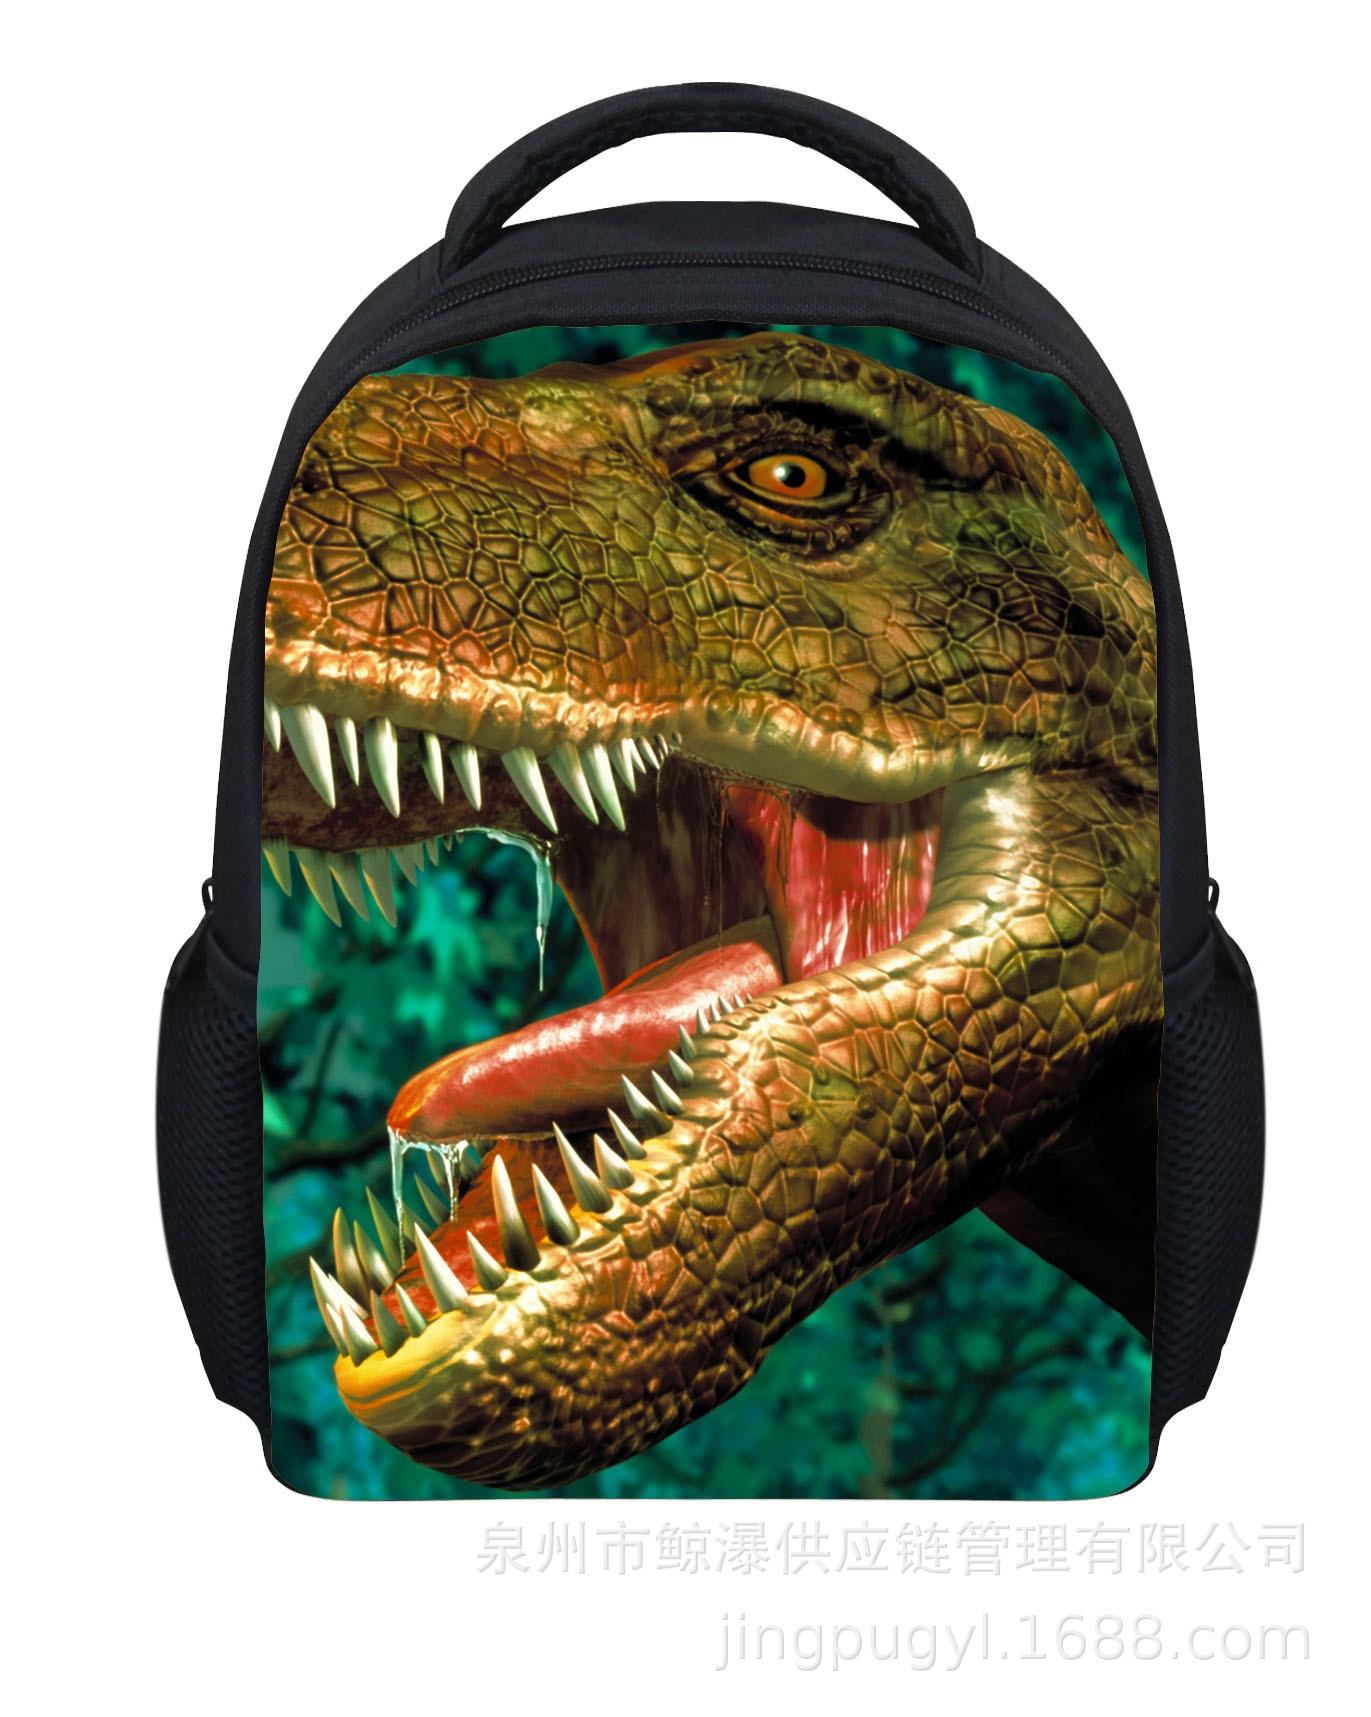 Hot Selling New Style Dinosaur Tiger Lion King CHILDREN'S Rucksack Students Mini School Bag Backpack